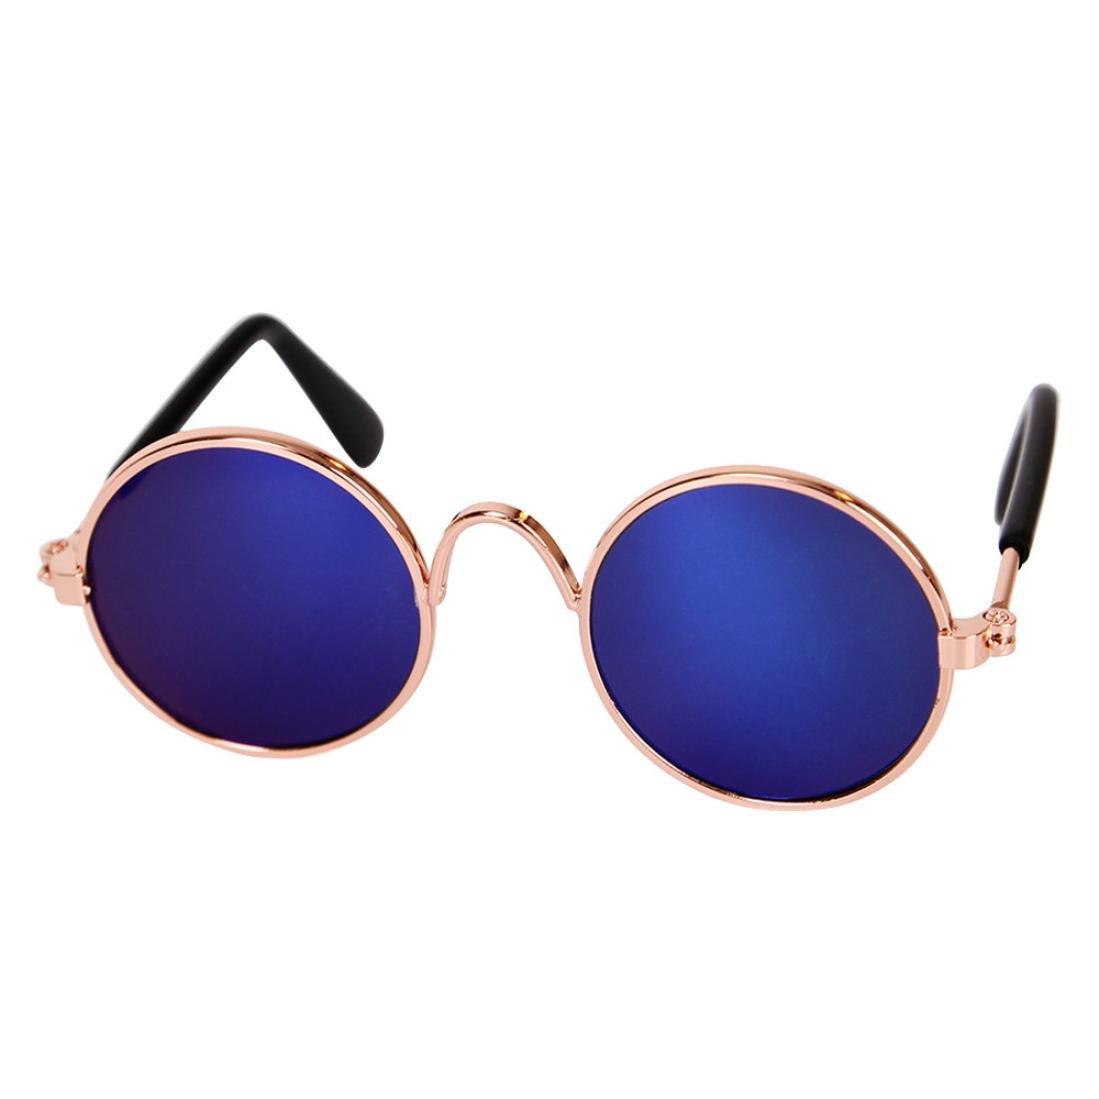 OOEOO Funny UV Sun Circular Glasses Eye Protection Wear Puppy Costume Cool Yellow, metal Pet Cat Dog Sunglasses